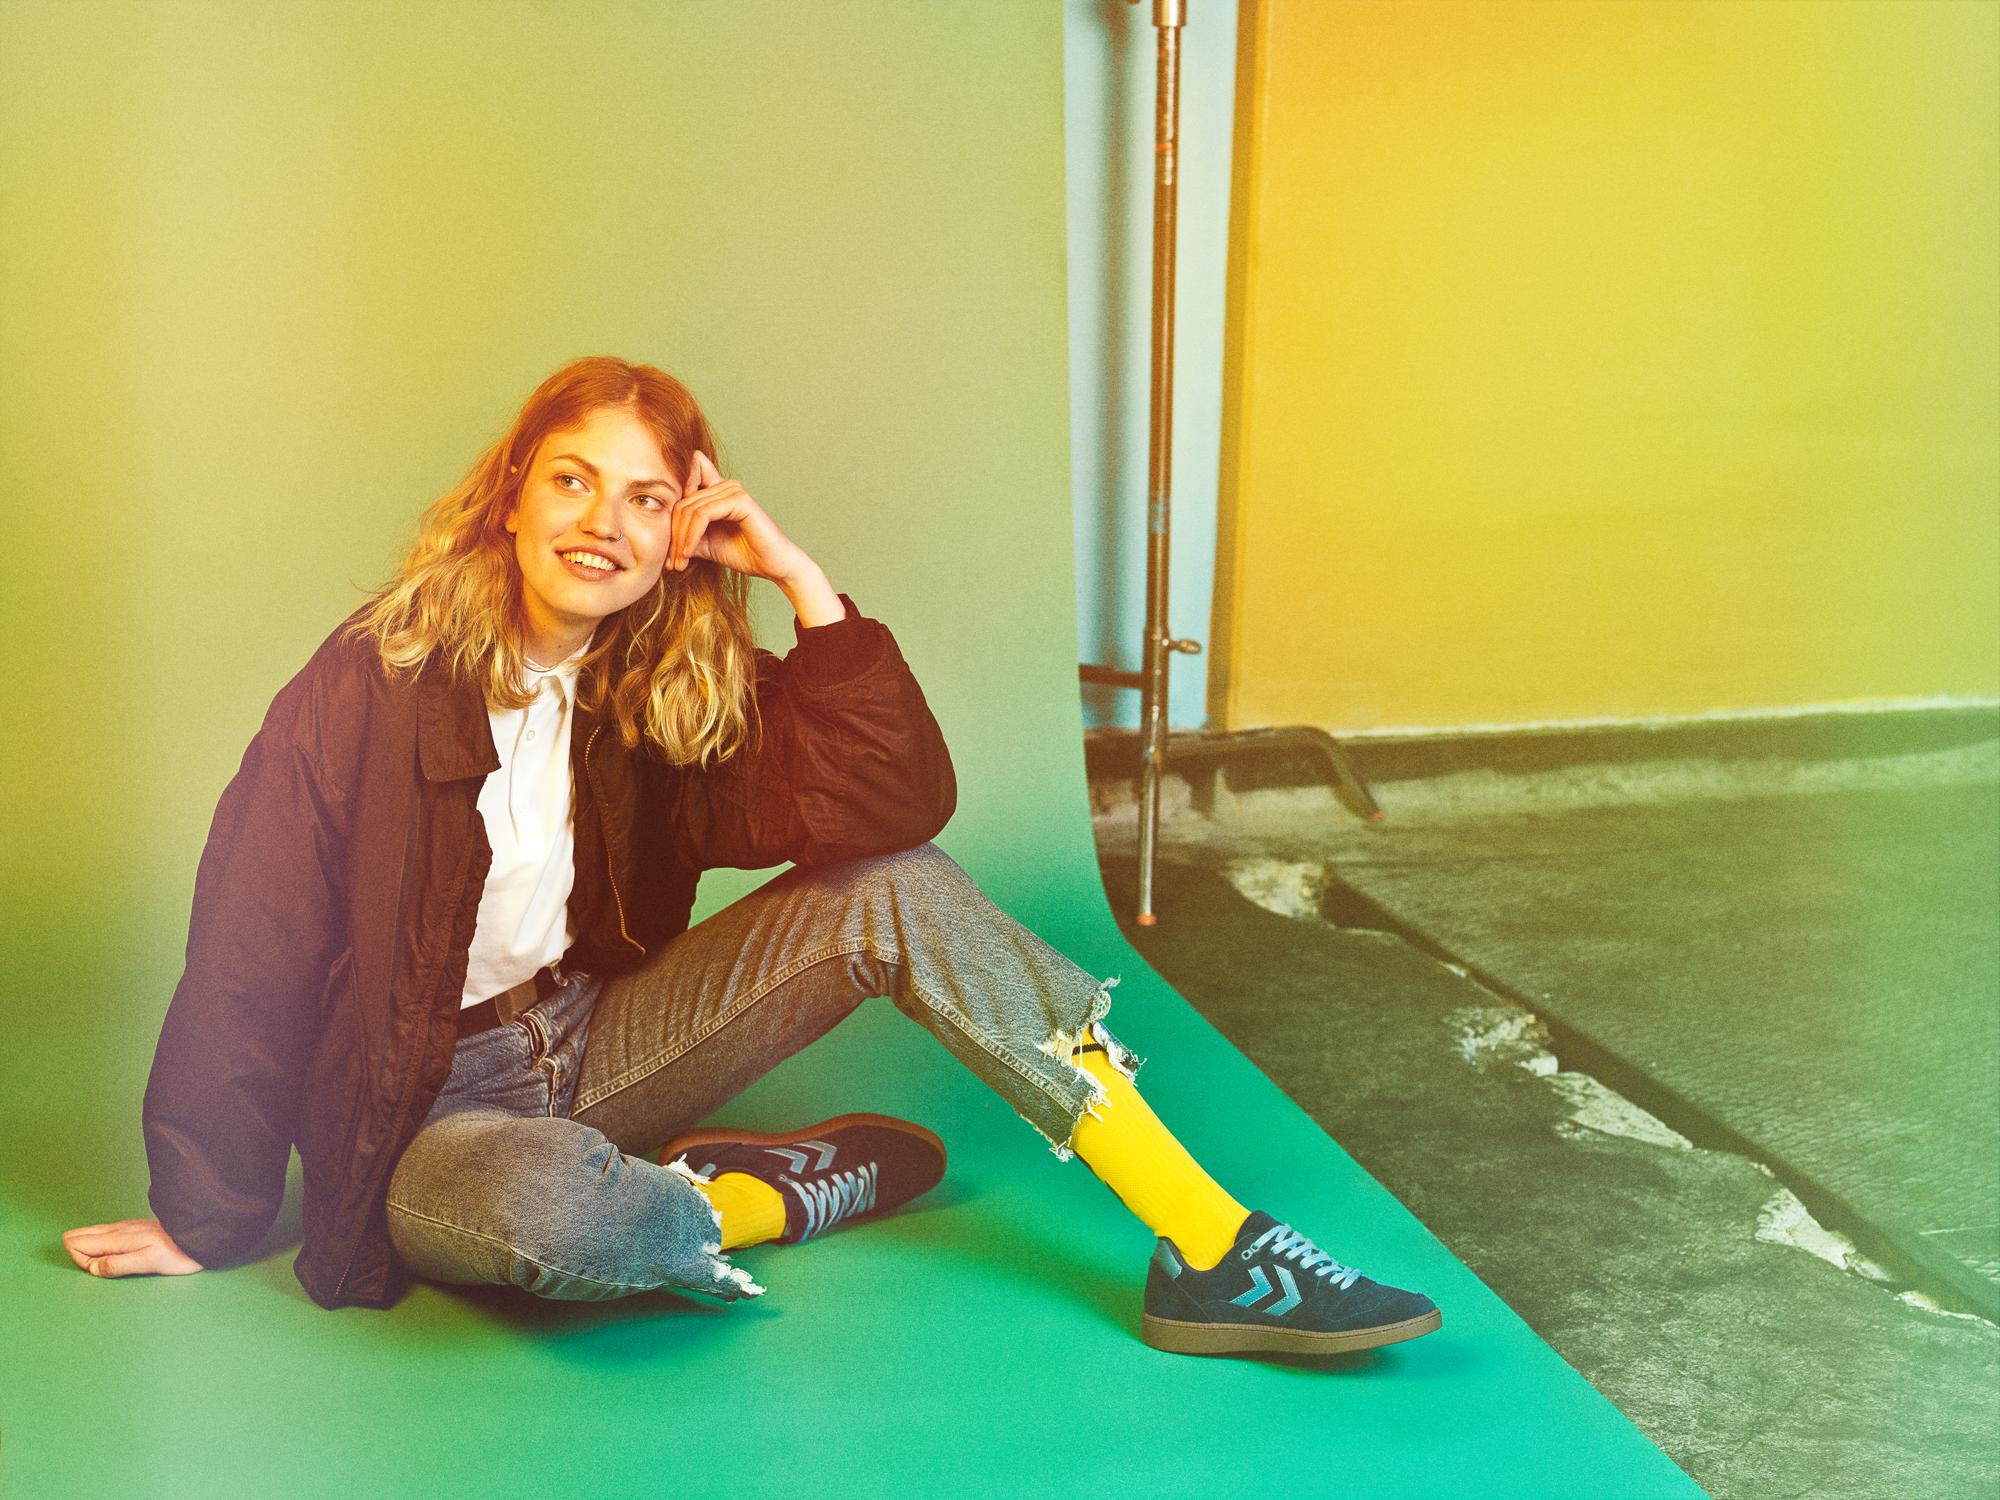 Hummel campaign by fashion photographer Kia Hartelius